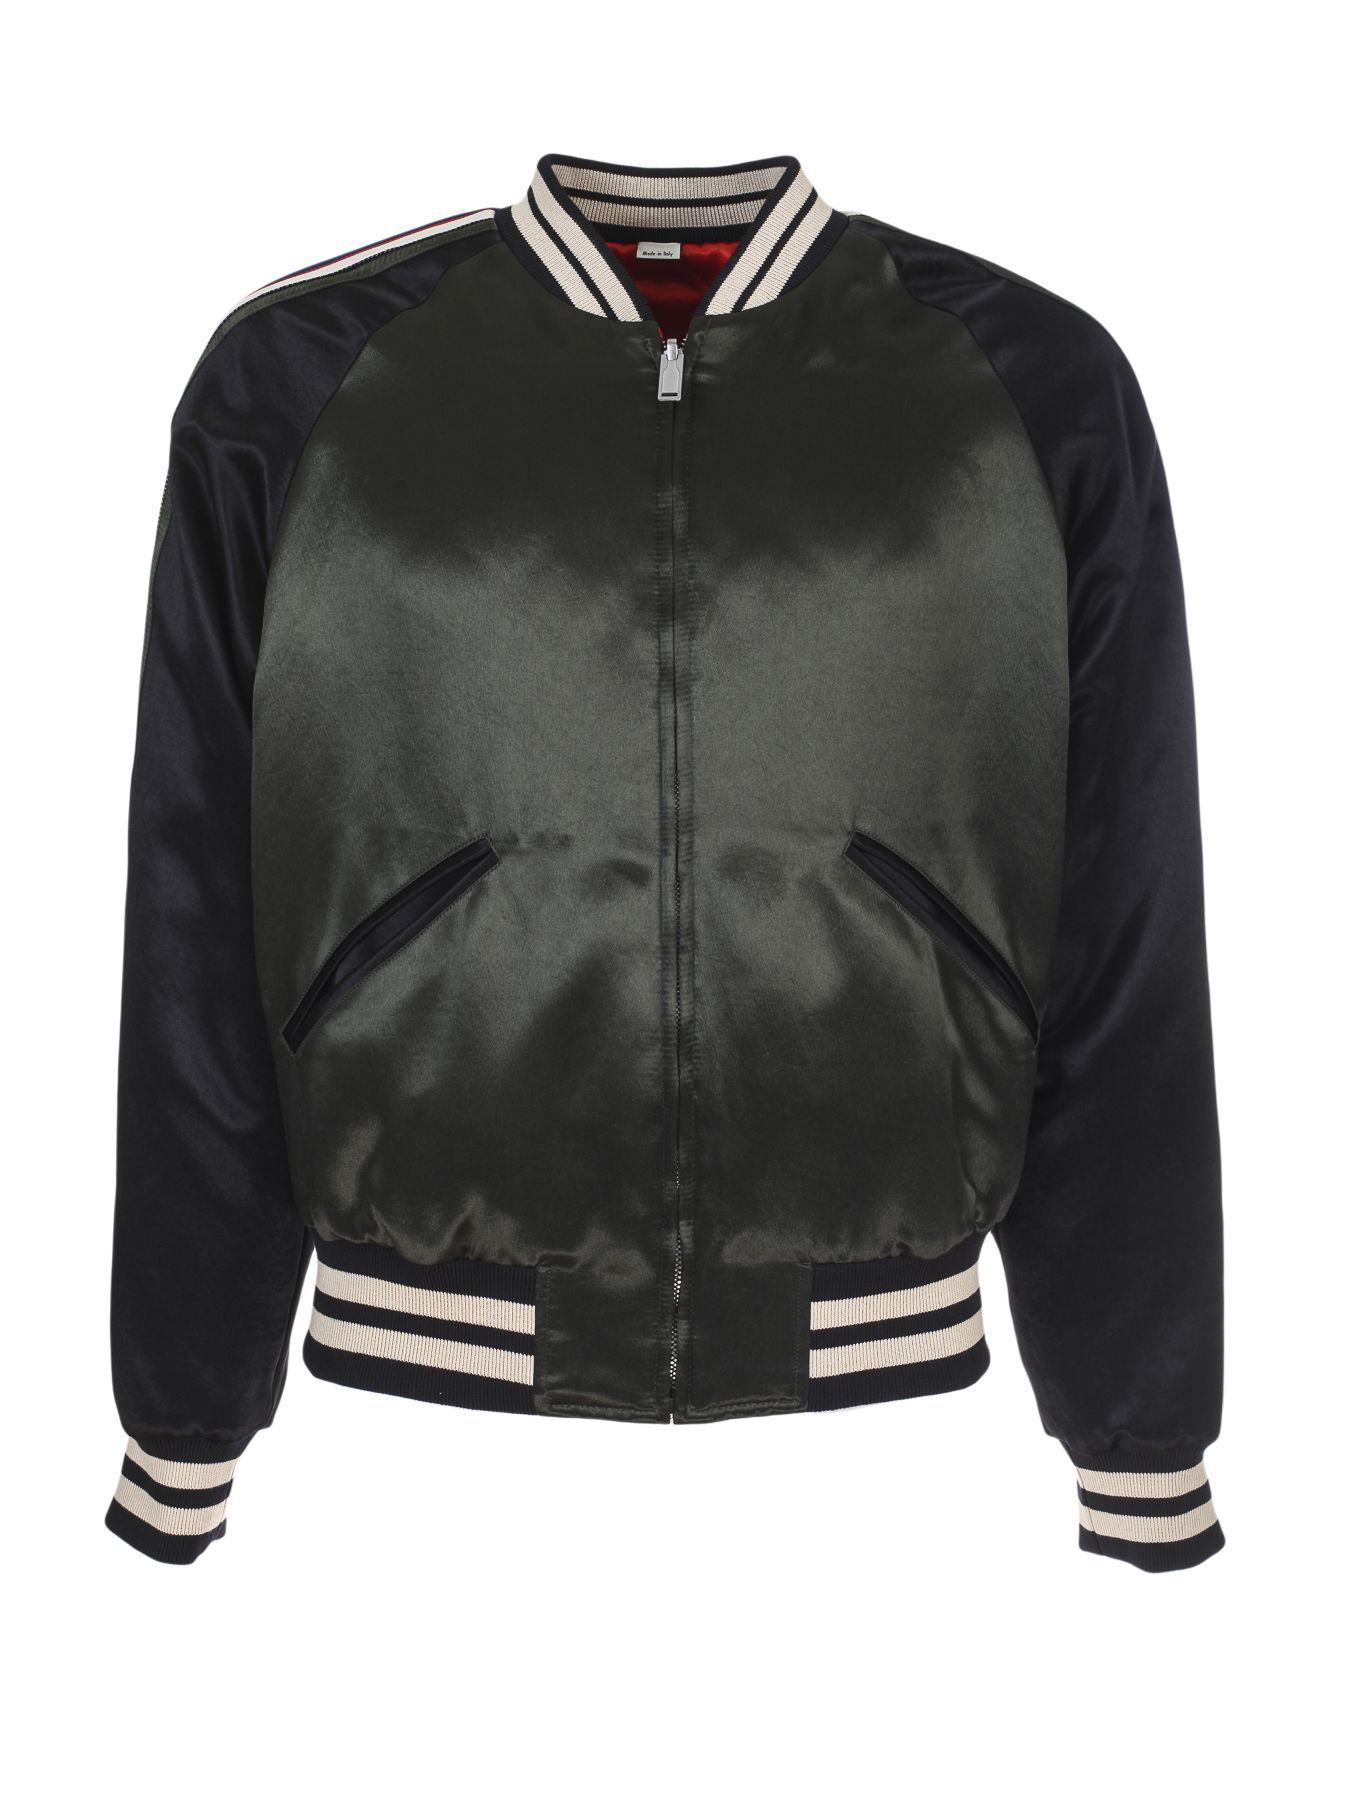 92b46ca25f9a2 Gucci Classic Bomber Jacket In Verde